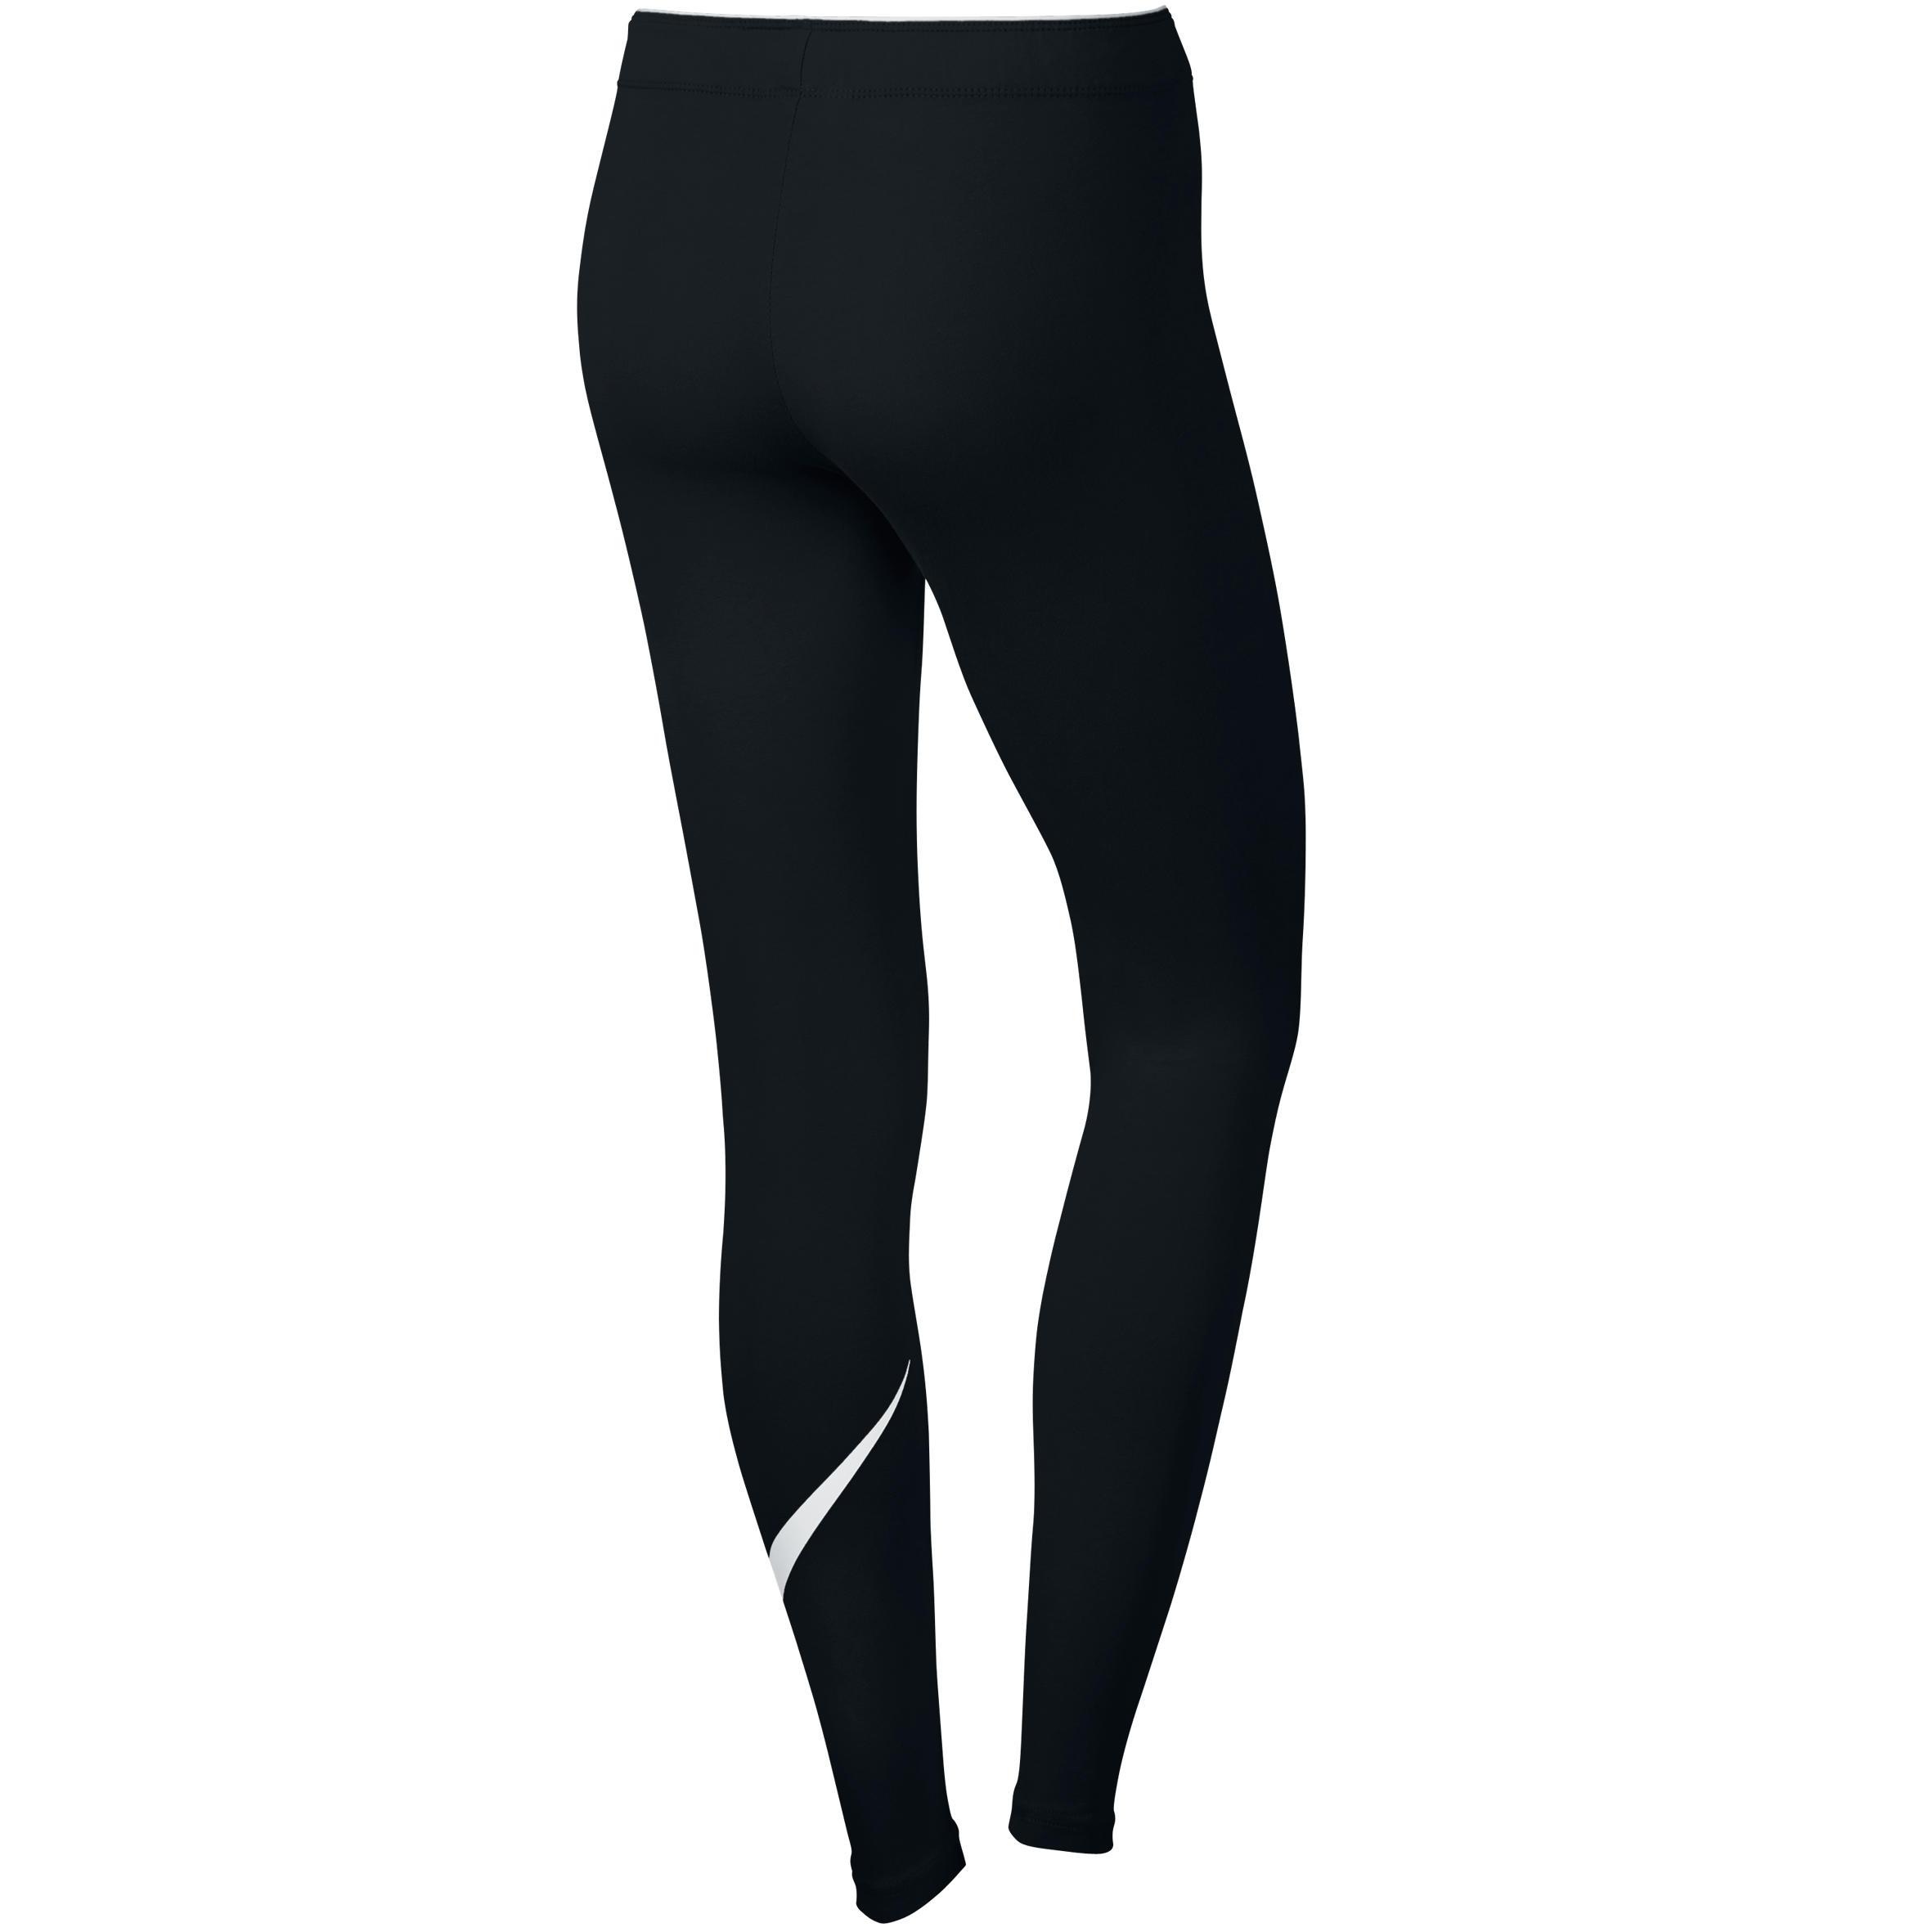 Nike Dameslegging voor gym en pilates zwart